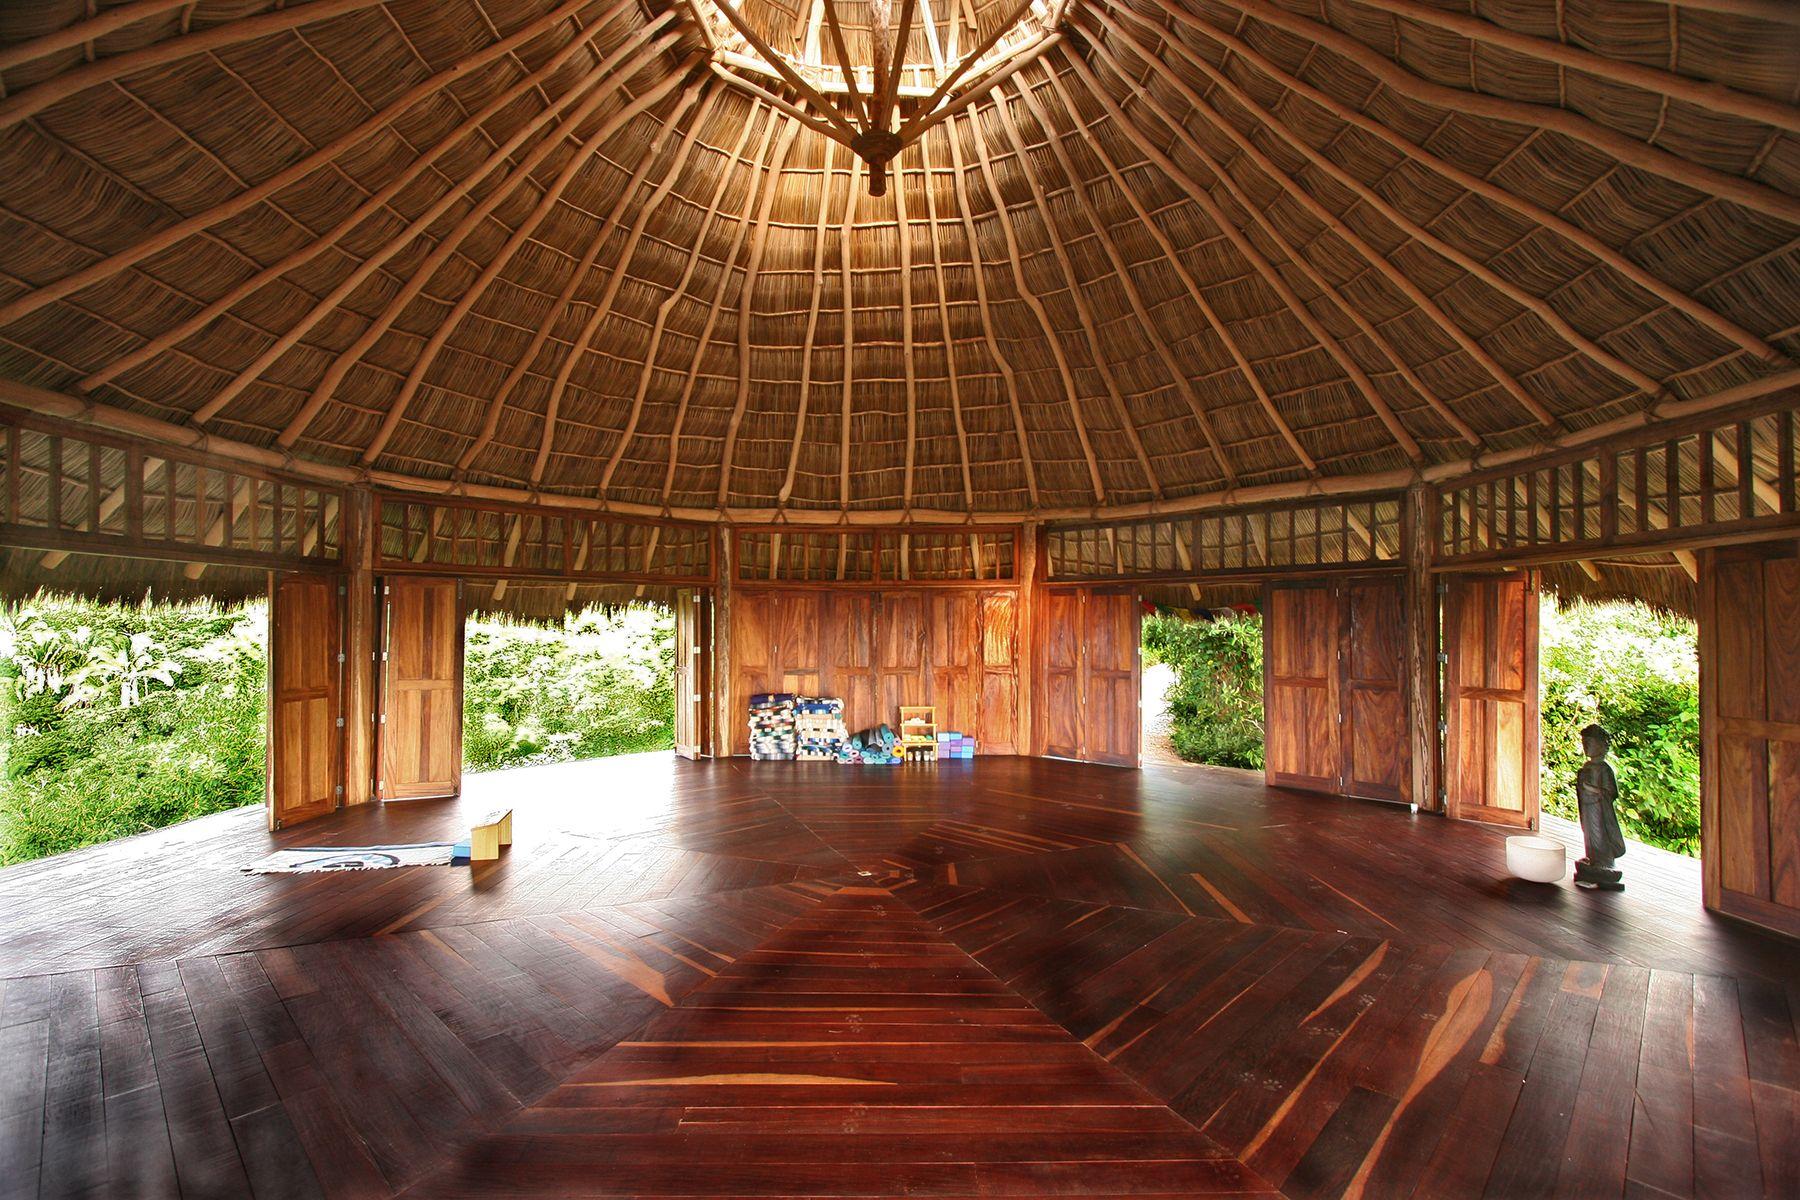 8Day Self Improvement Retreat at Haramara Yoga studio